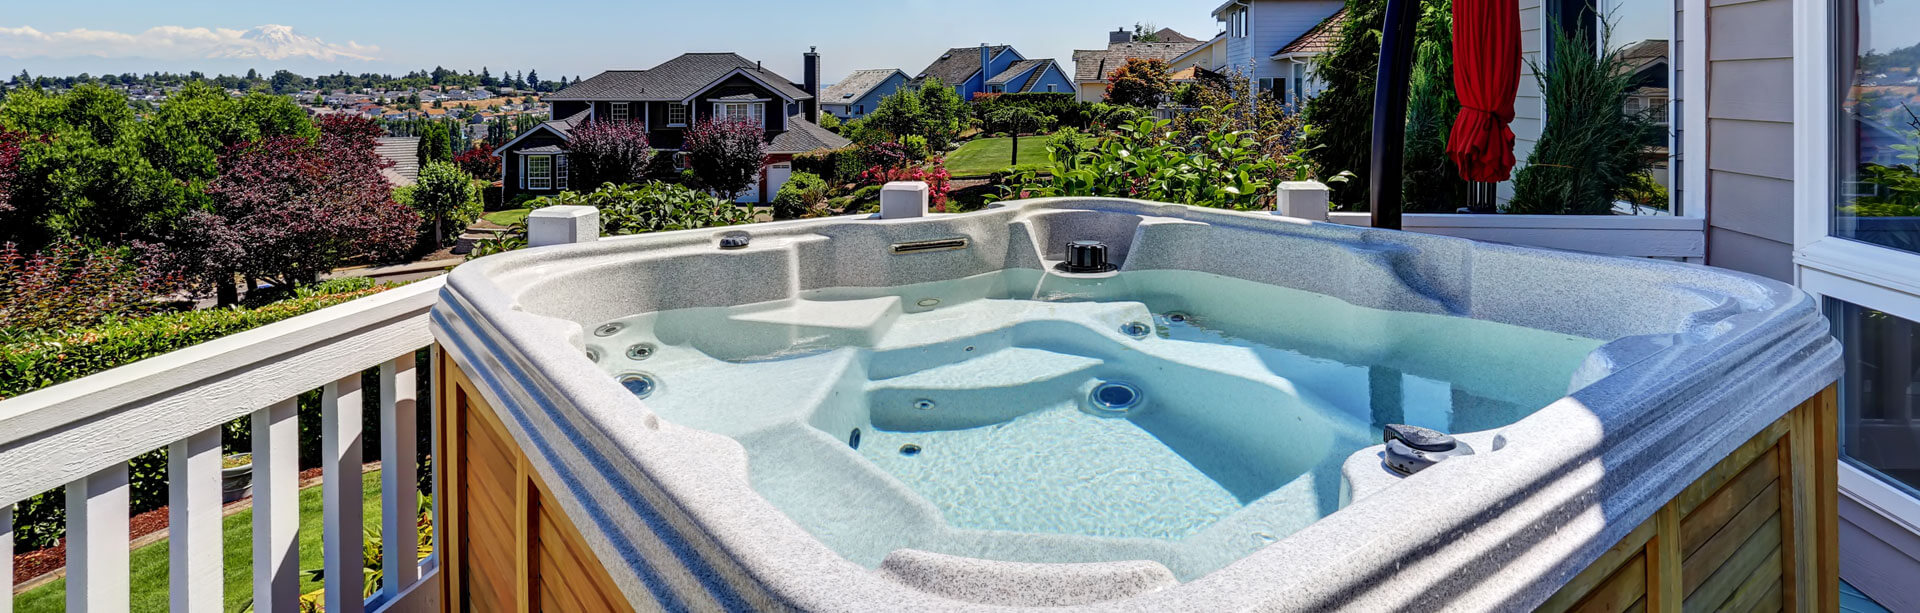 Hot Tub - Chambersburg, PA - Outdoor Living LLC